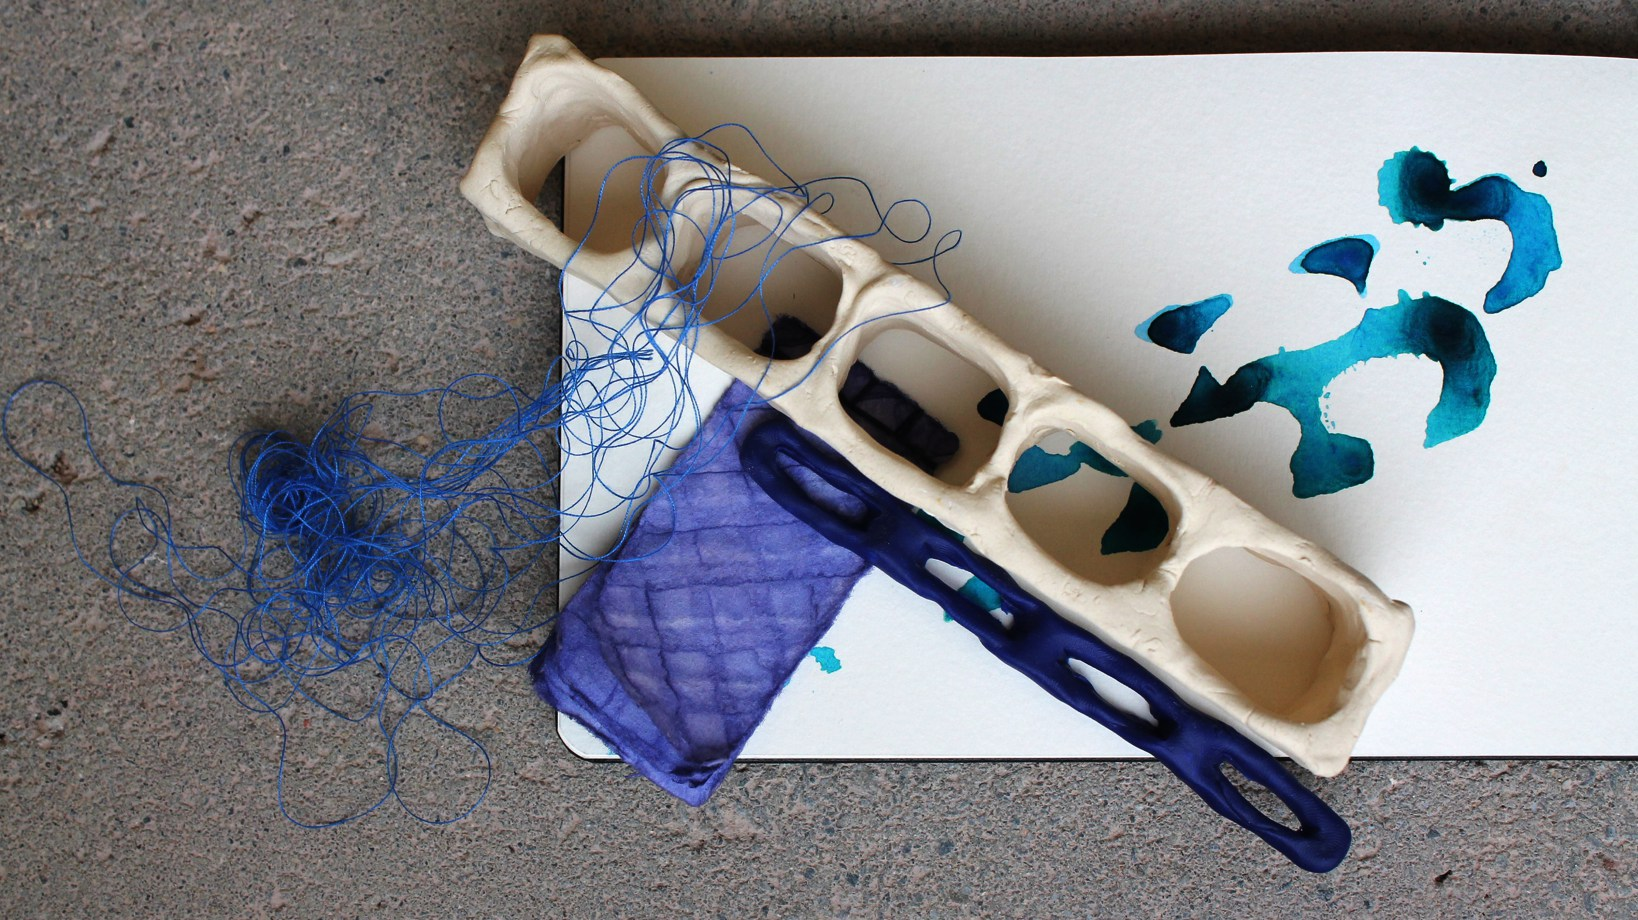 Current Resident Artist,Roberta Massuch